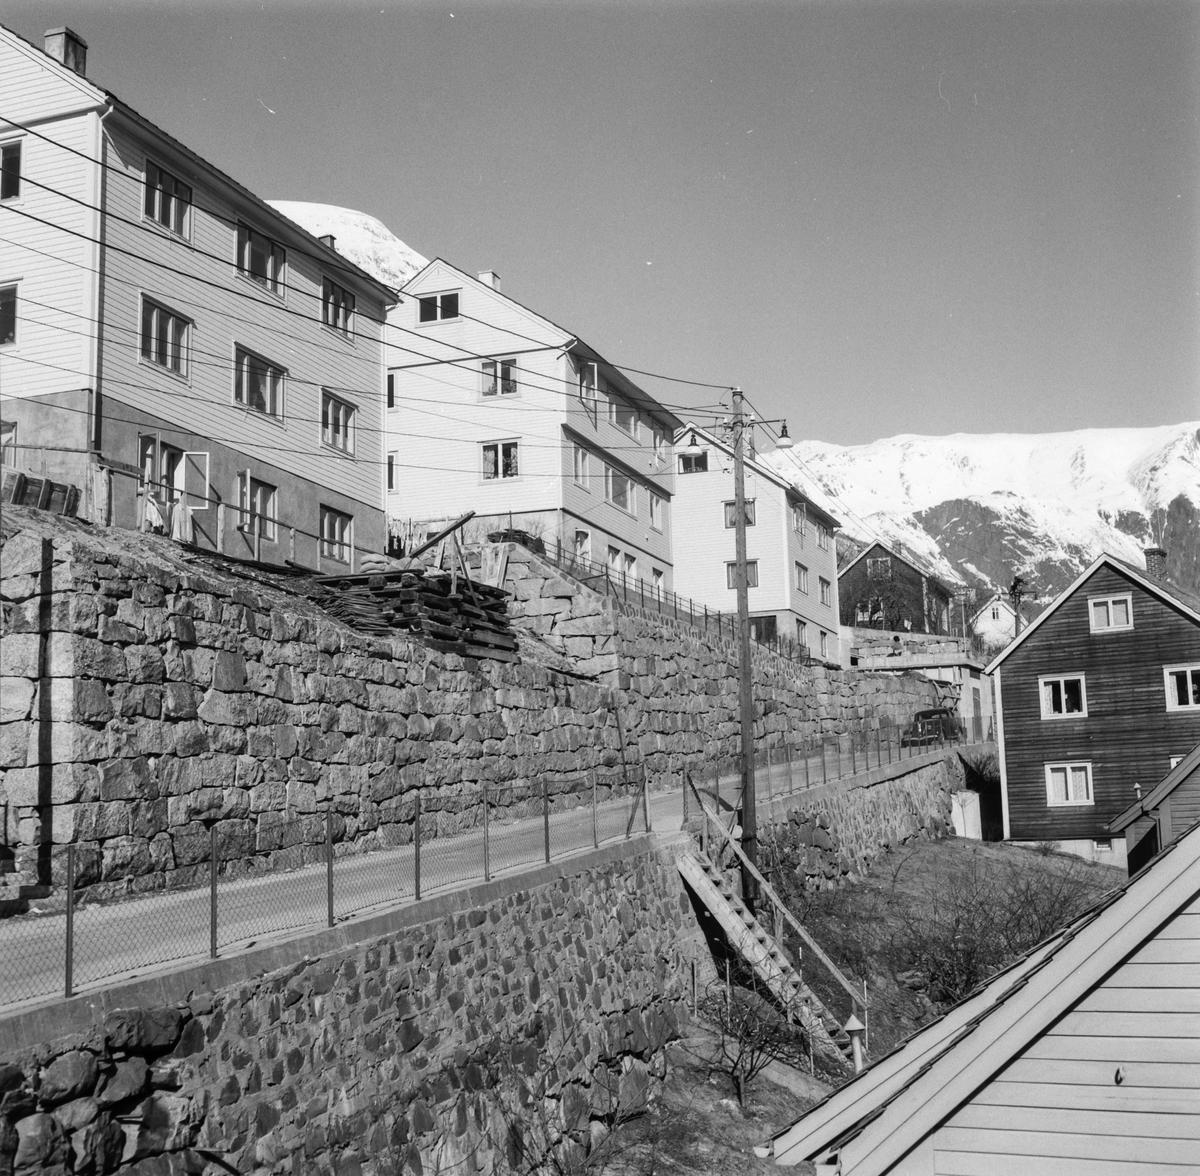 Kalvanes, bustadhus, snødekte fjell, stolpar, trapp, bil